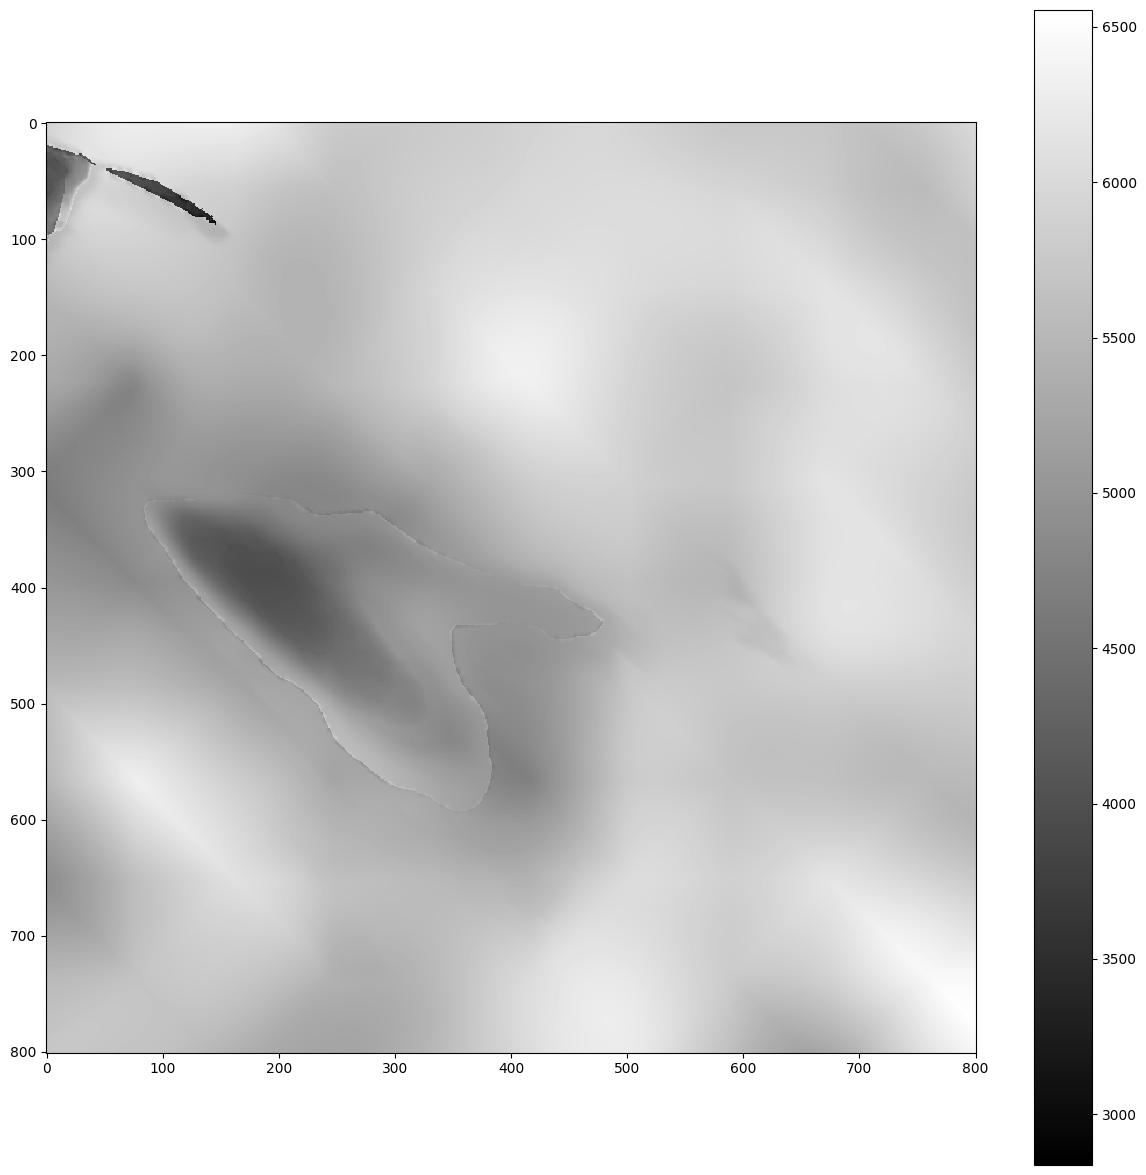 bench/seismic/wp/la_habra/meshes/velocity_model/plots/vp_5000.png